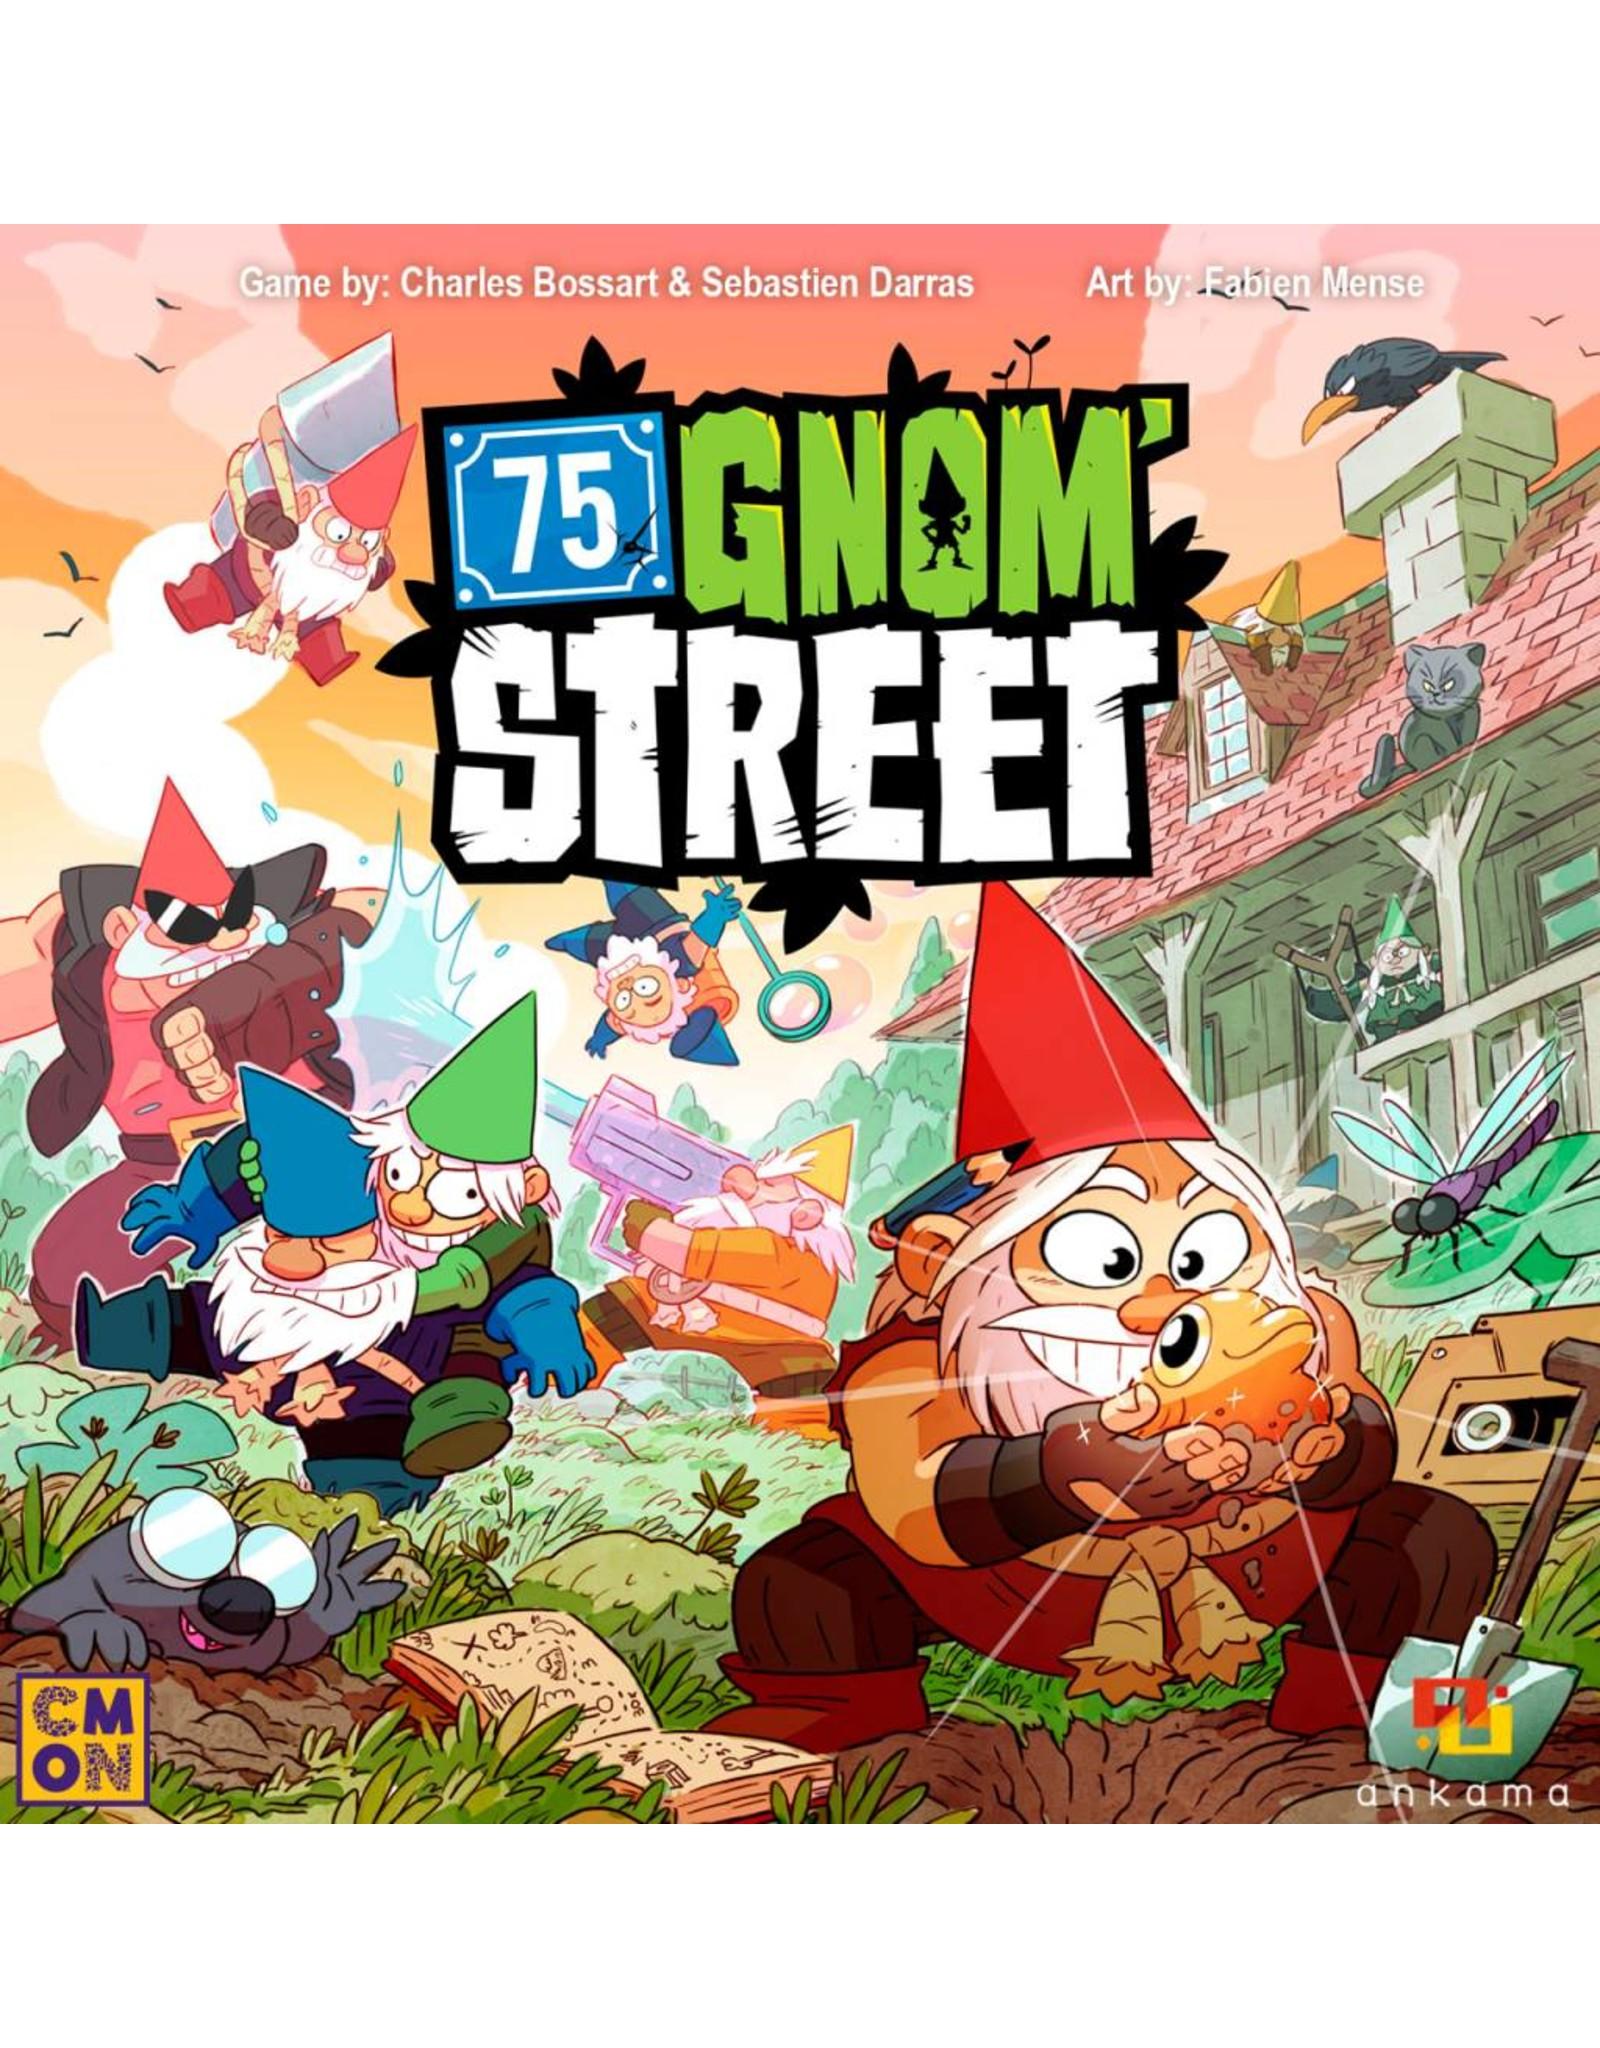 CMON 75 GNOM' STREET